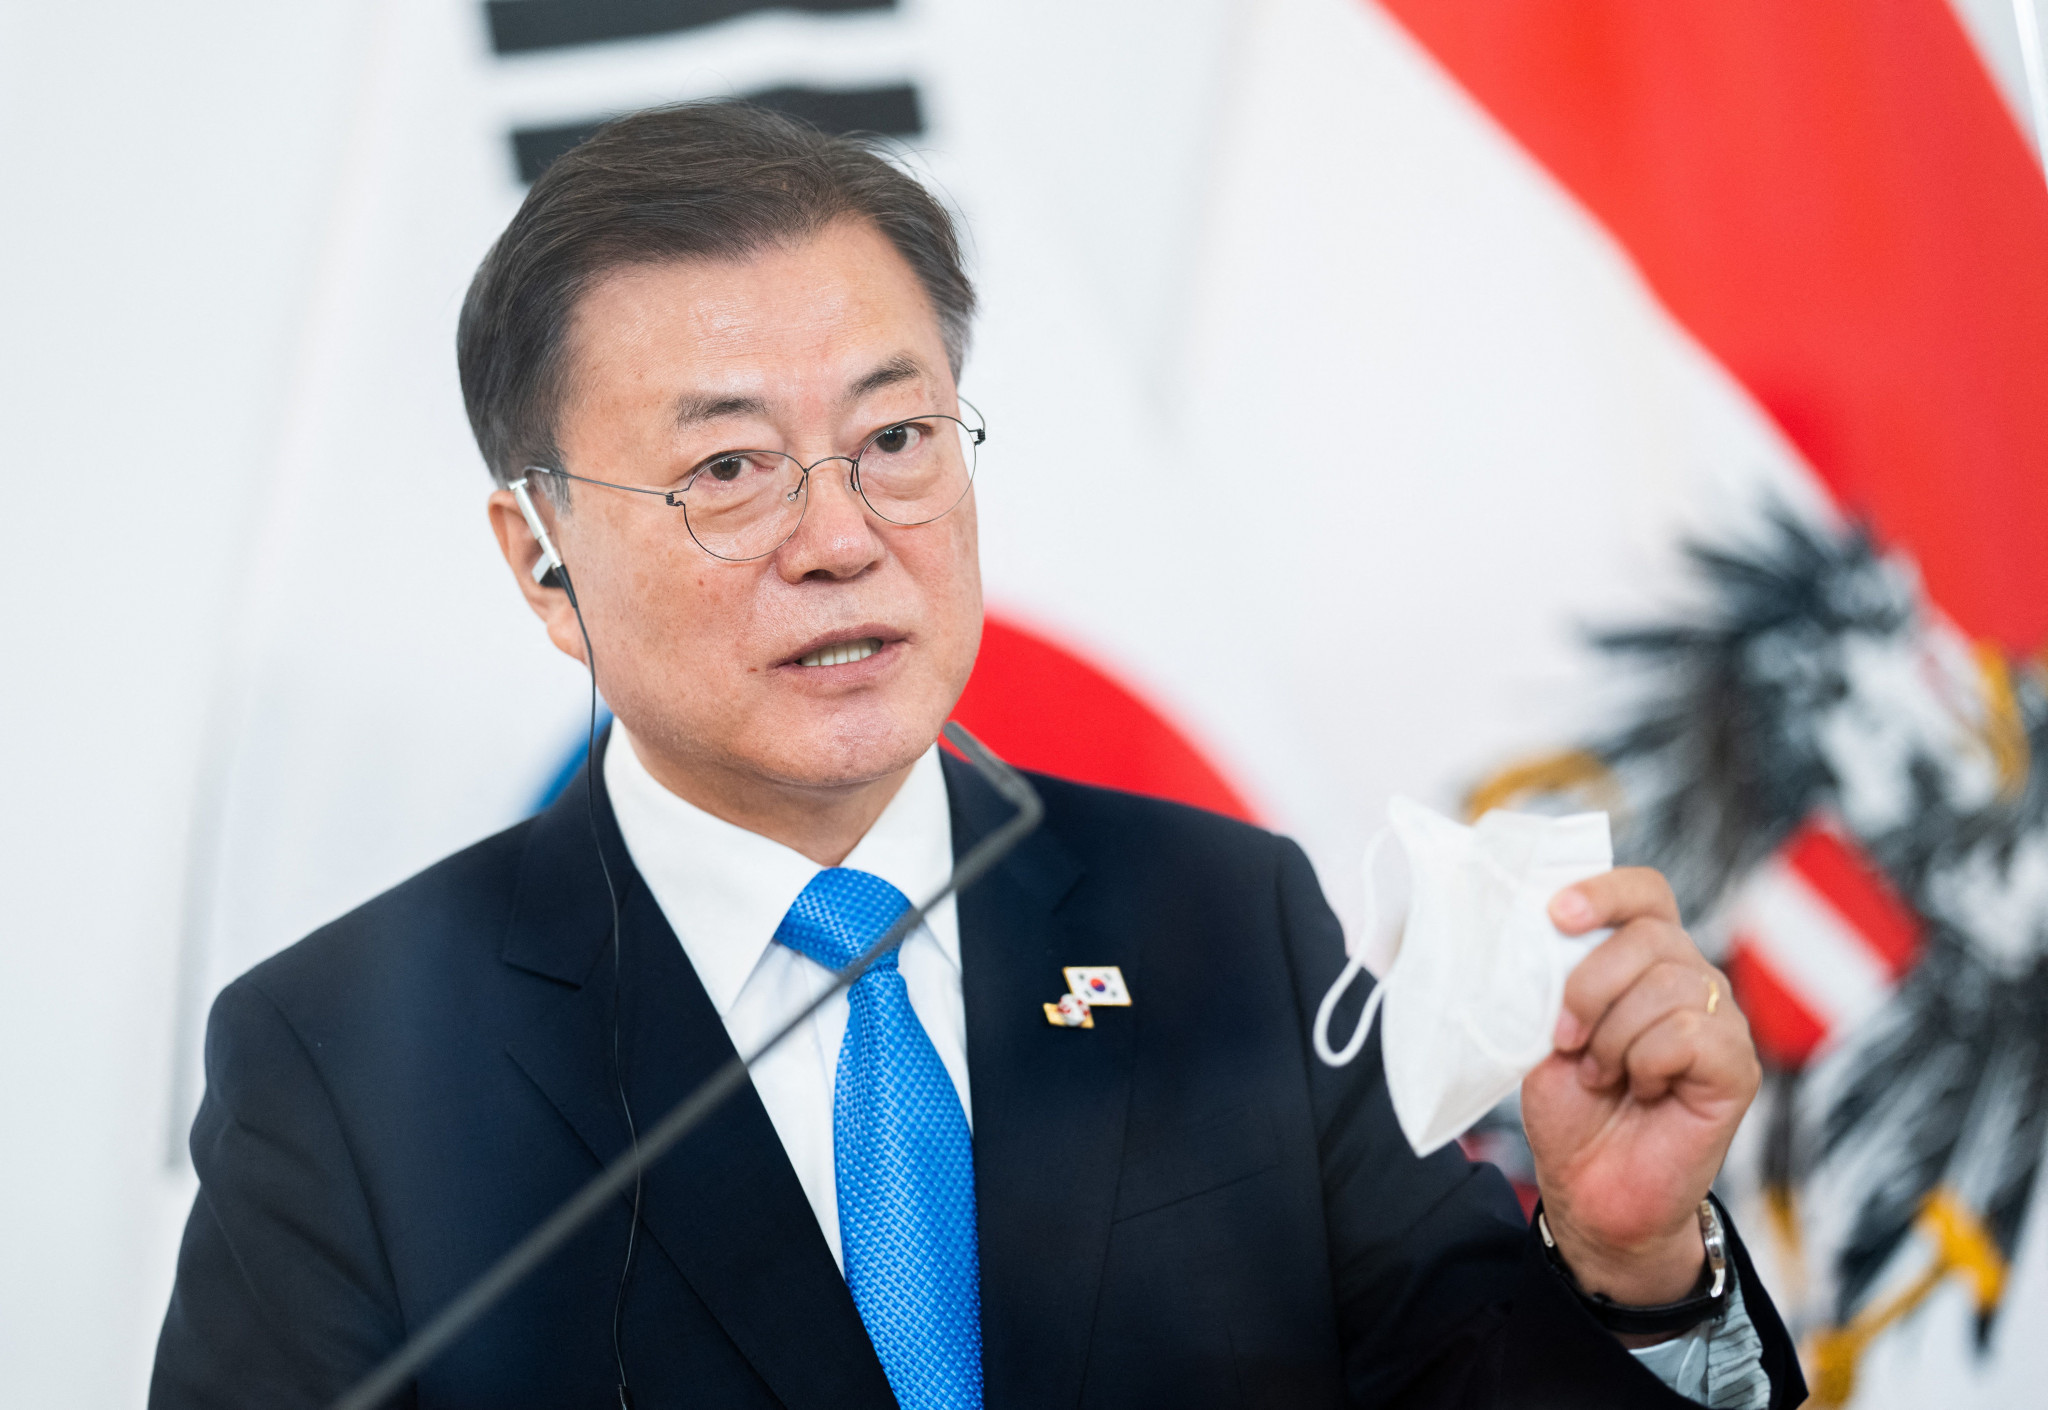 South Korean President Moon decides against Tokyo 2020 trip for summit